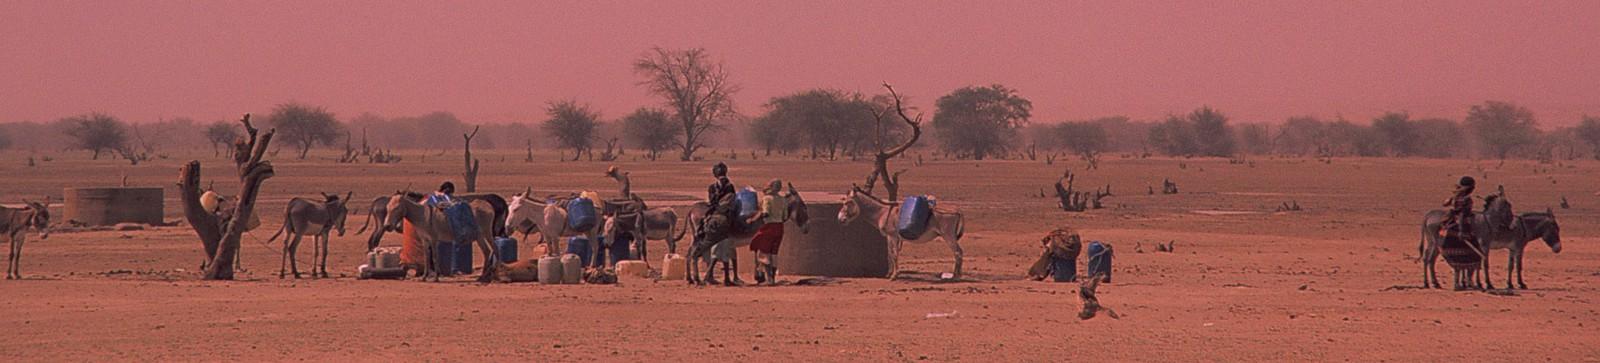 Transporting water © UNESCO/Giorgio Faedo